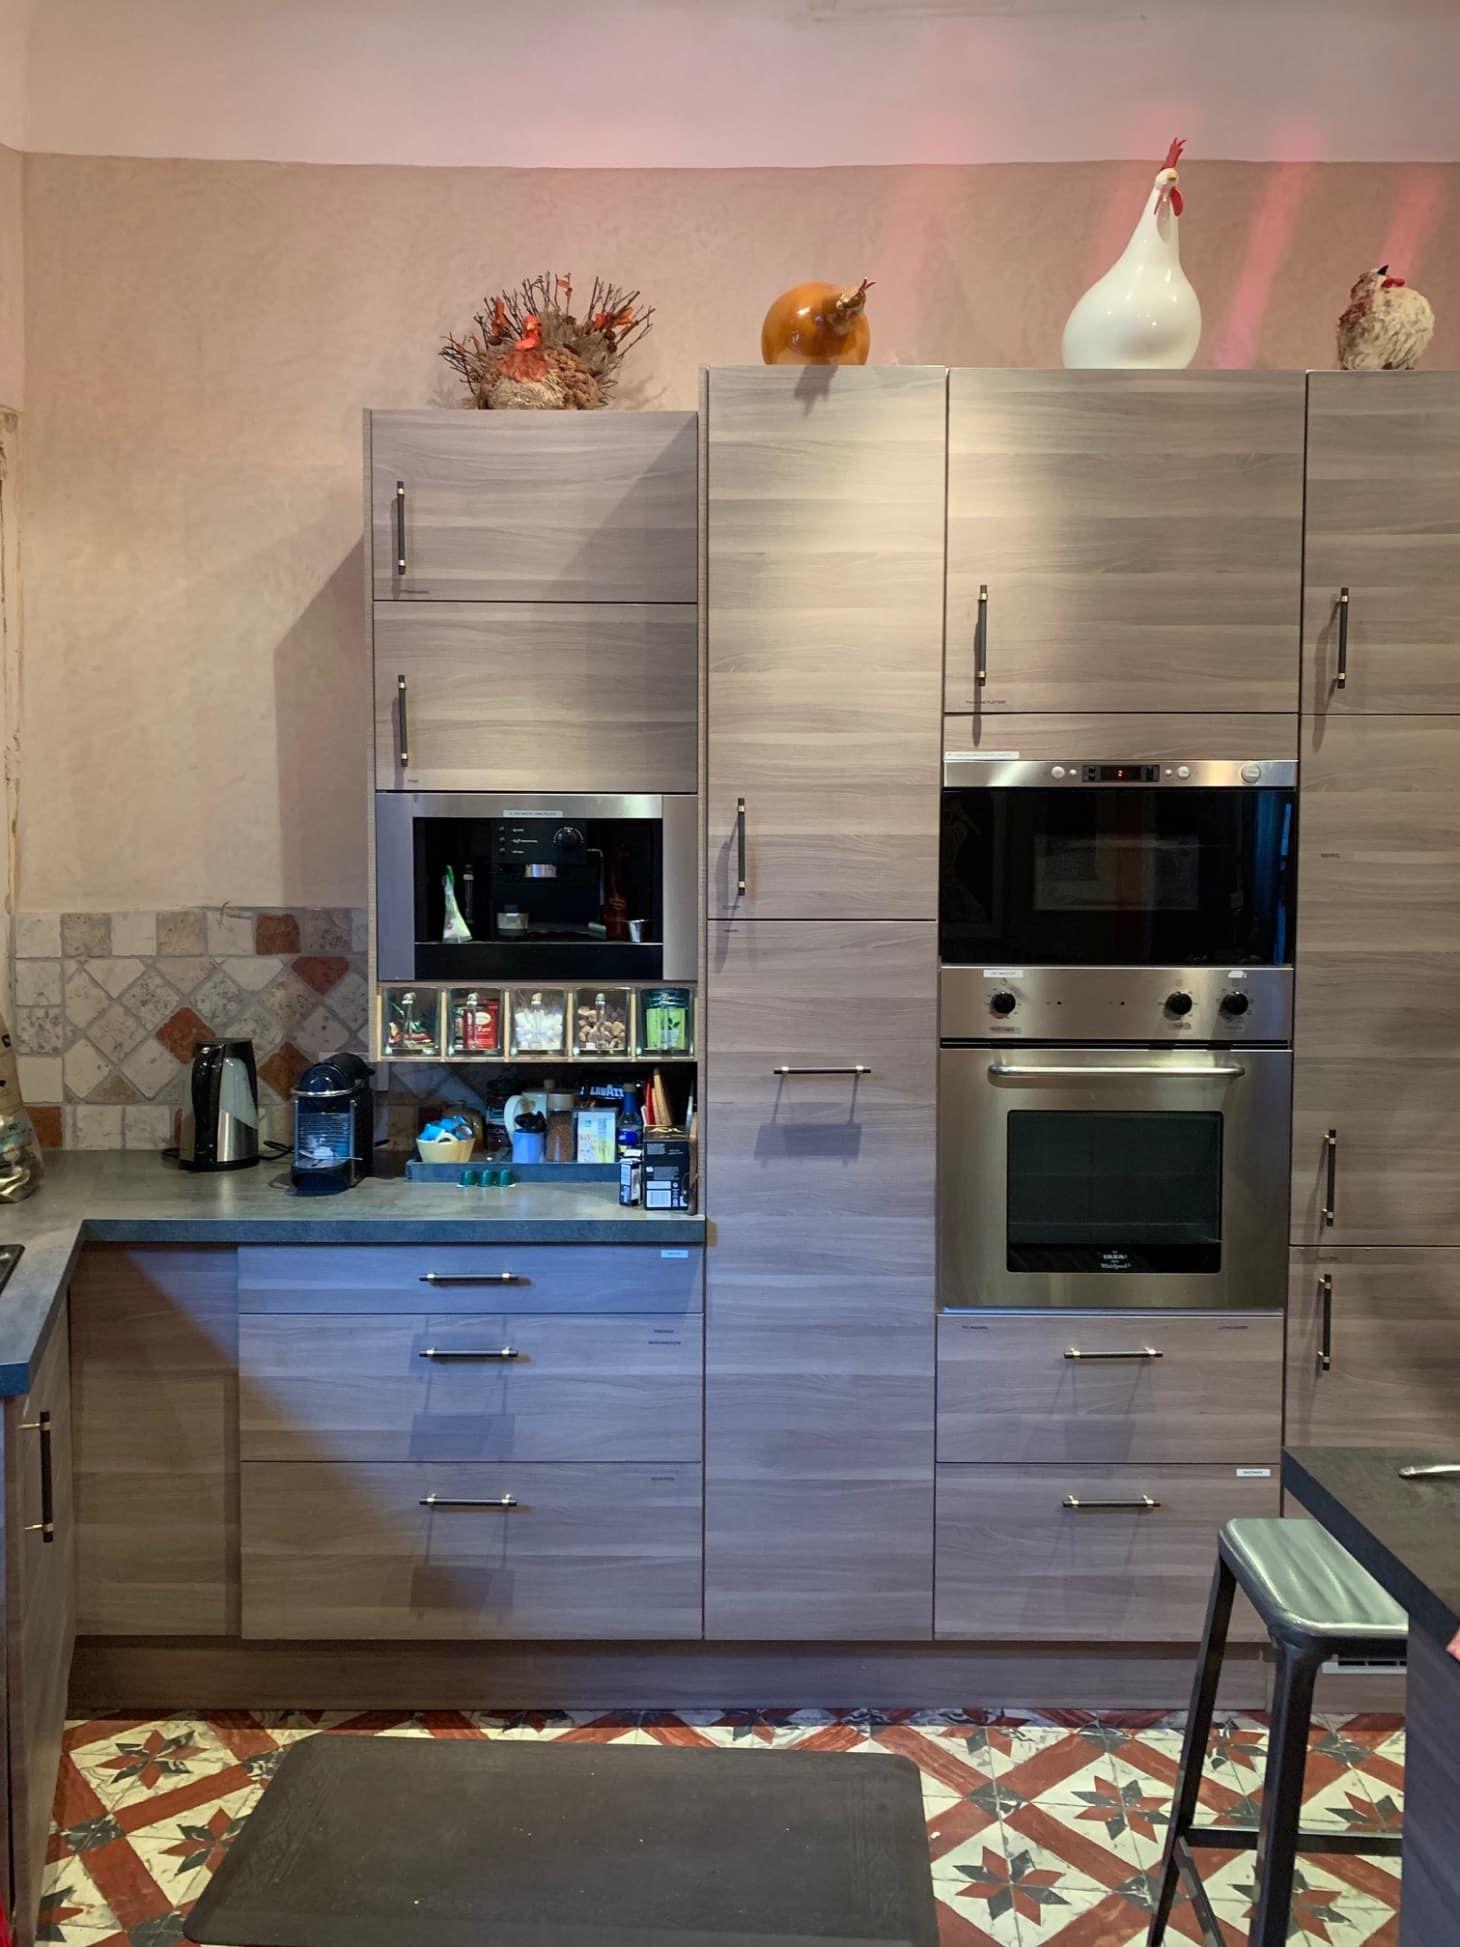 Ikea Kitchen Cost Estimate 2021 in 2020 Cost of